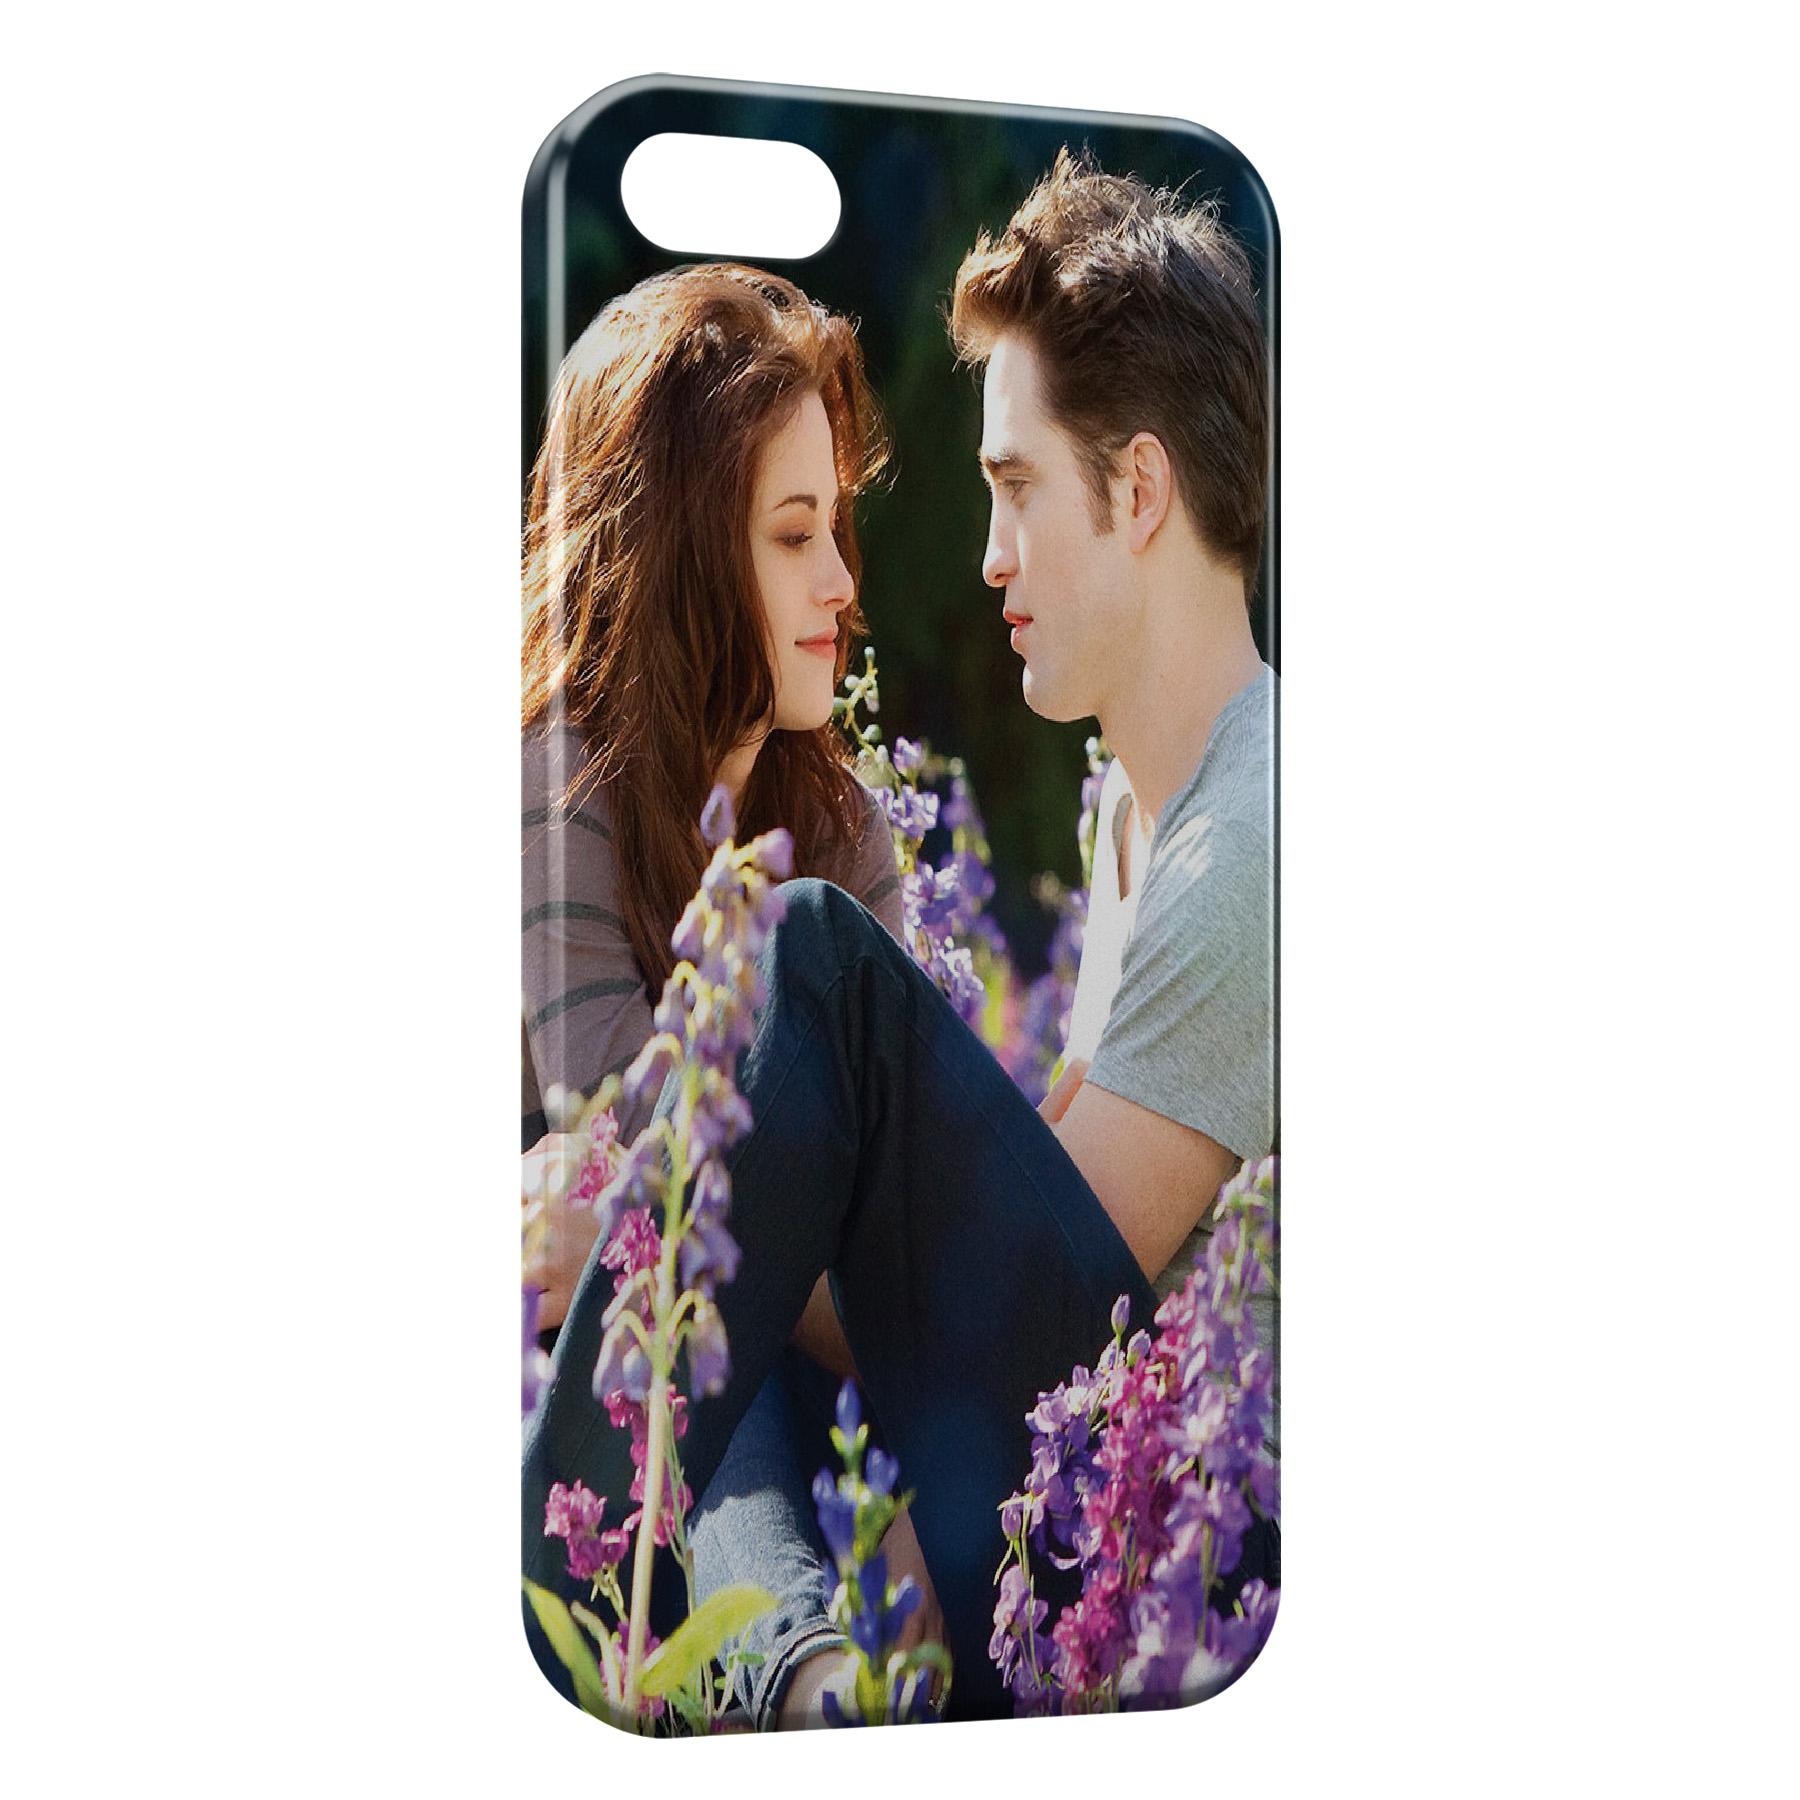 Coque iPhone 5/5S/SE Twilight Love